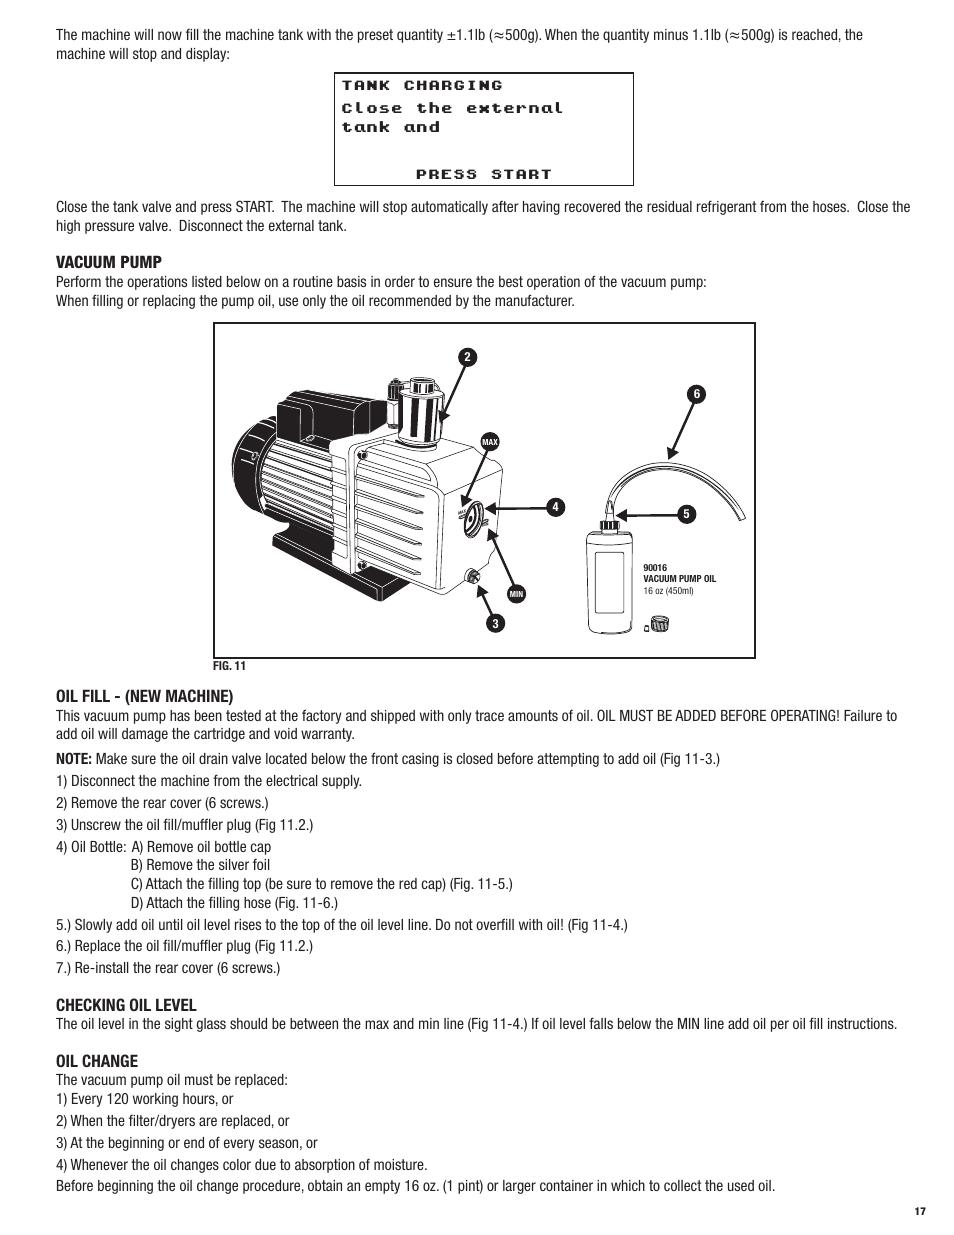 Vacuum pump, Oil fill - (new machine), Checking oil level